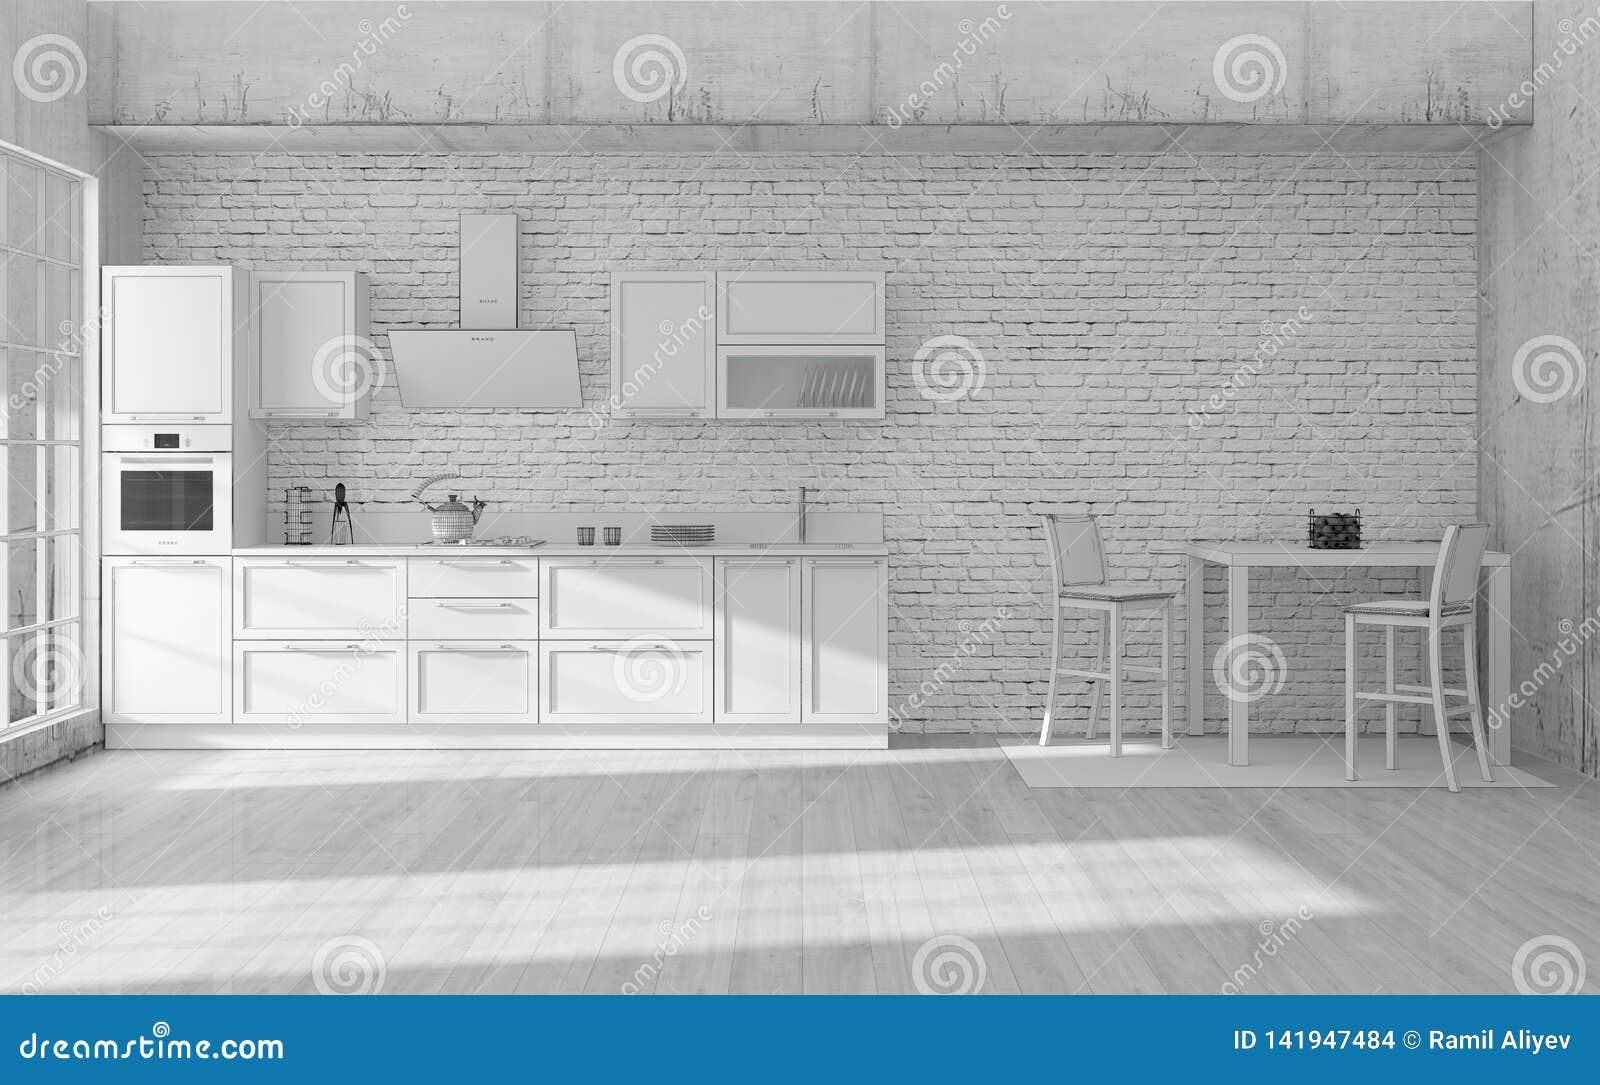 Kitchen Interior Grid 3d Rendering Stock Illustration Illustration Of Chair Design 141947484